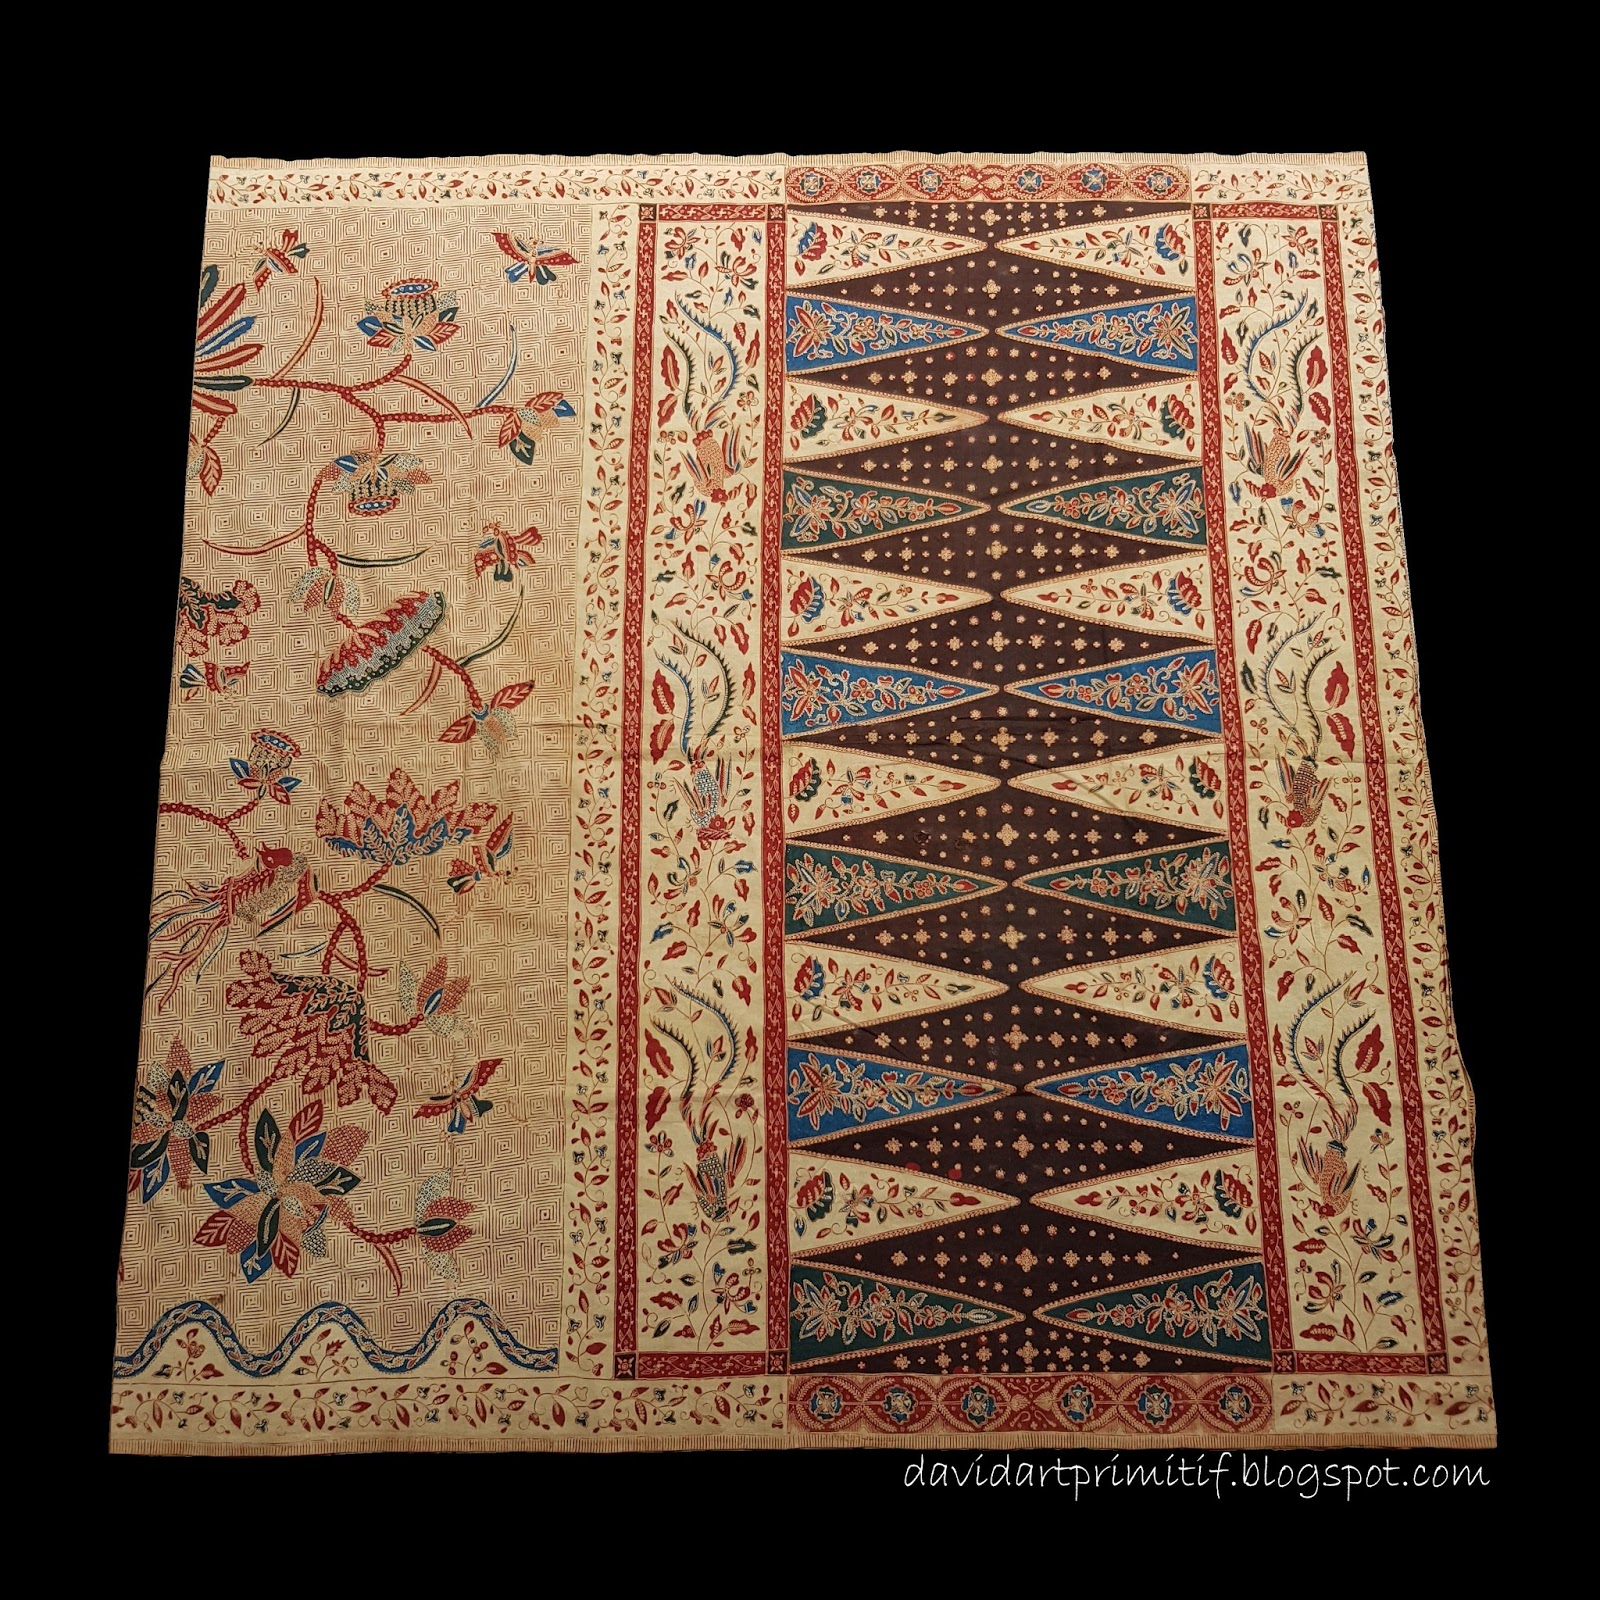 4 Penemu Batik Tulis: Art & Primitif: Sarung Batik Tulis Lasem Tua Bangbironjon